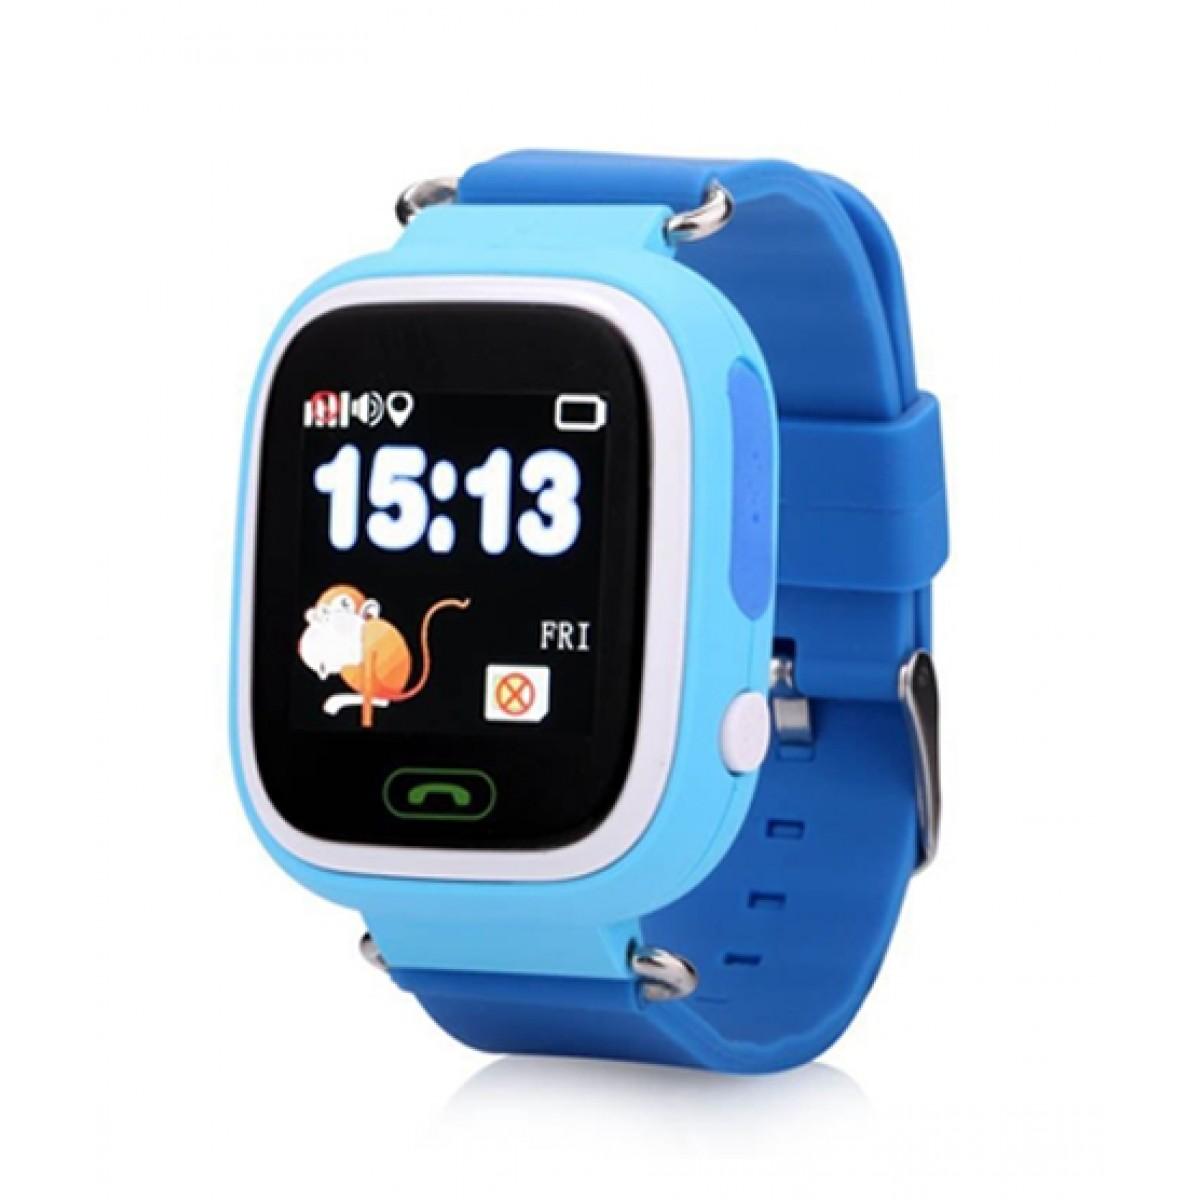 b6f161e0e8c Corporate Traders GPS Smart Watch GSM Price in Pakistan | Buy Corporate  Traders GPS Smart Watch GSM Blue (Q90) | iShopping.pk